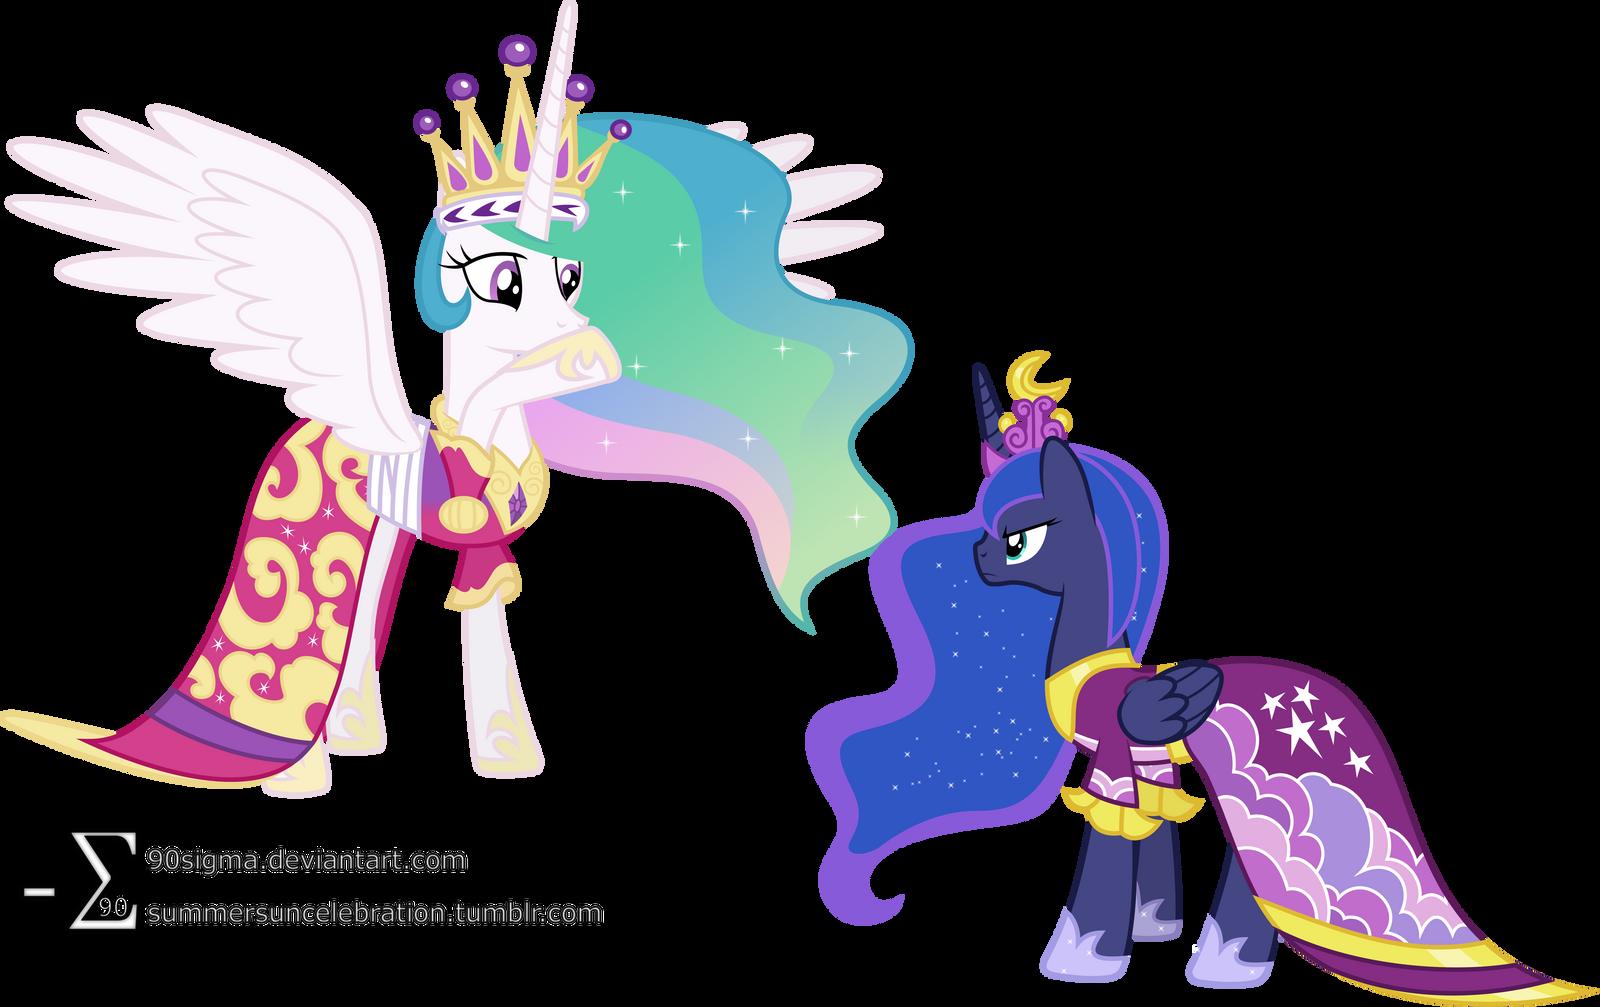 Luna Confronts Celestia Coronation Dresses Ver By 90Sigma On